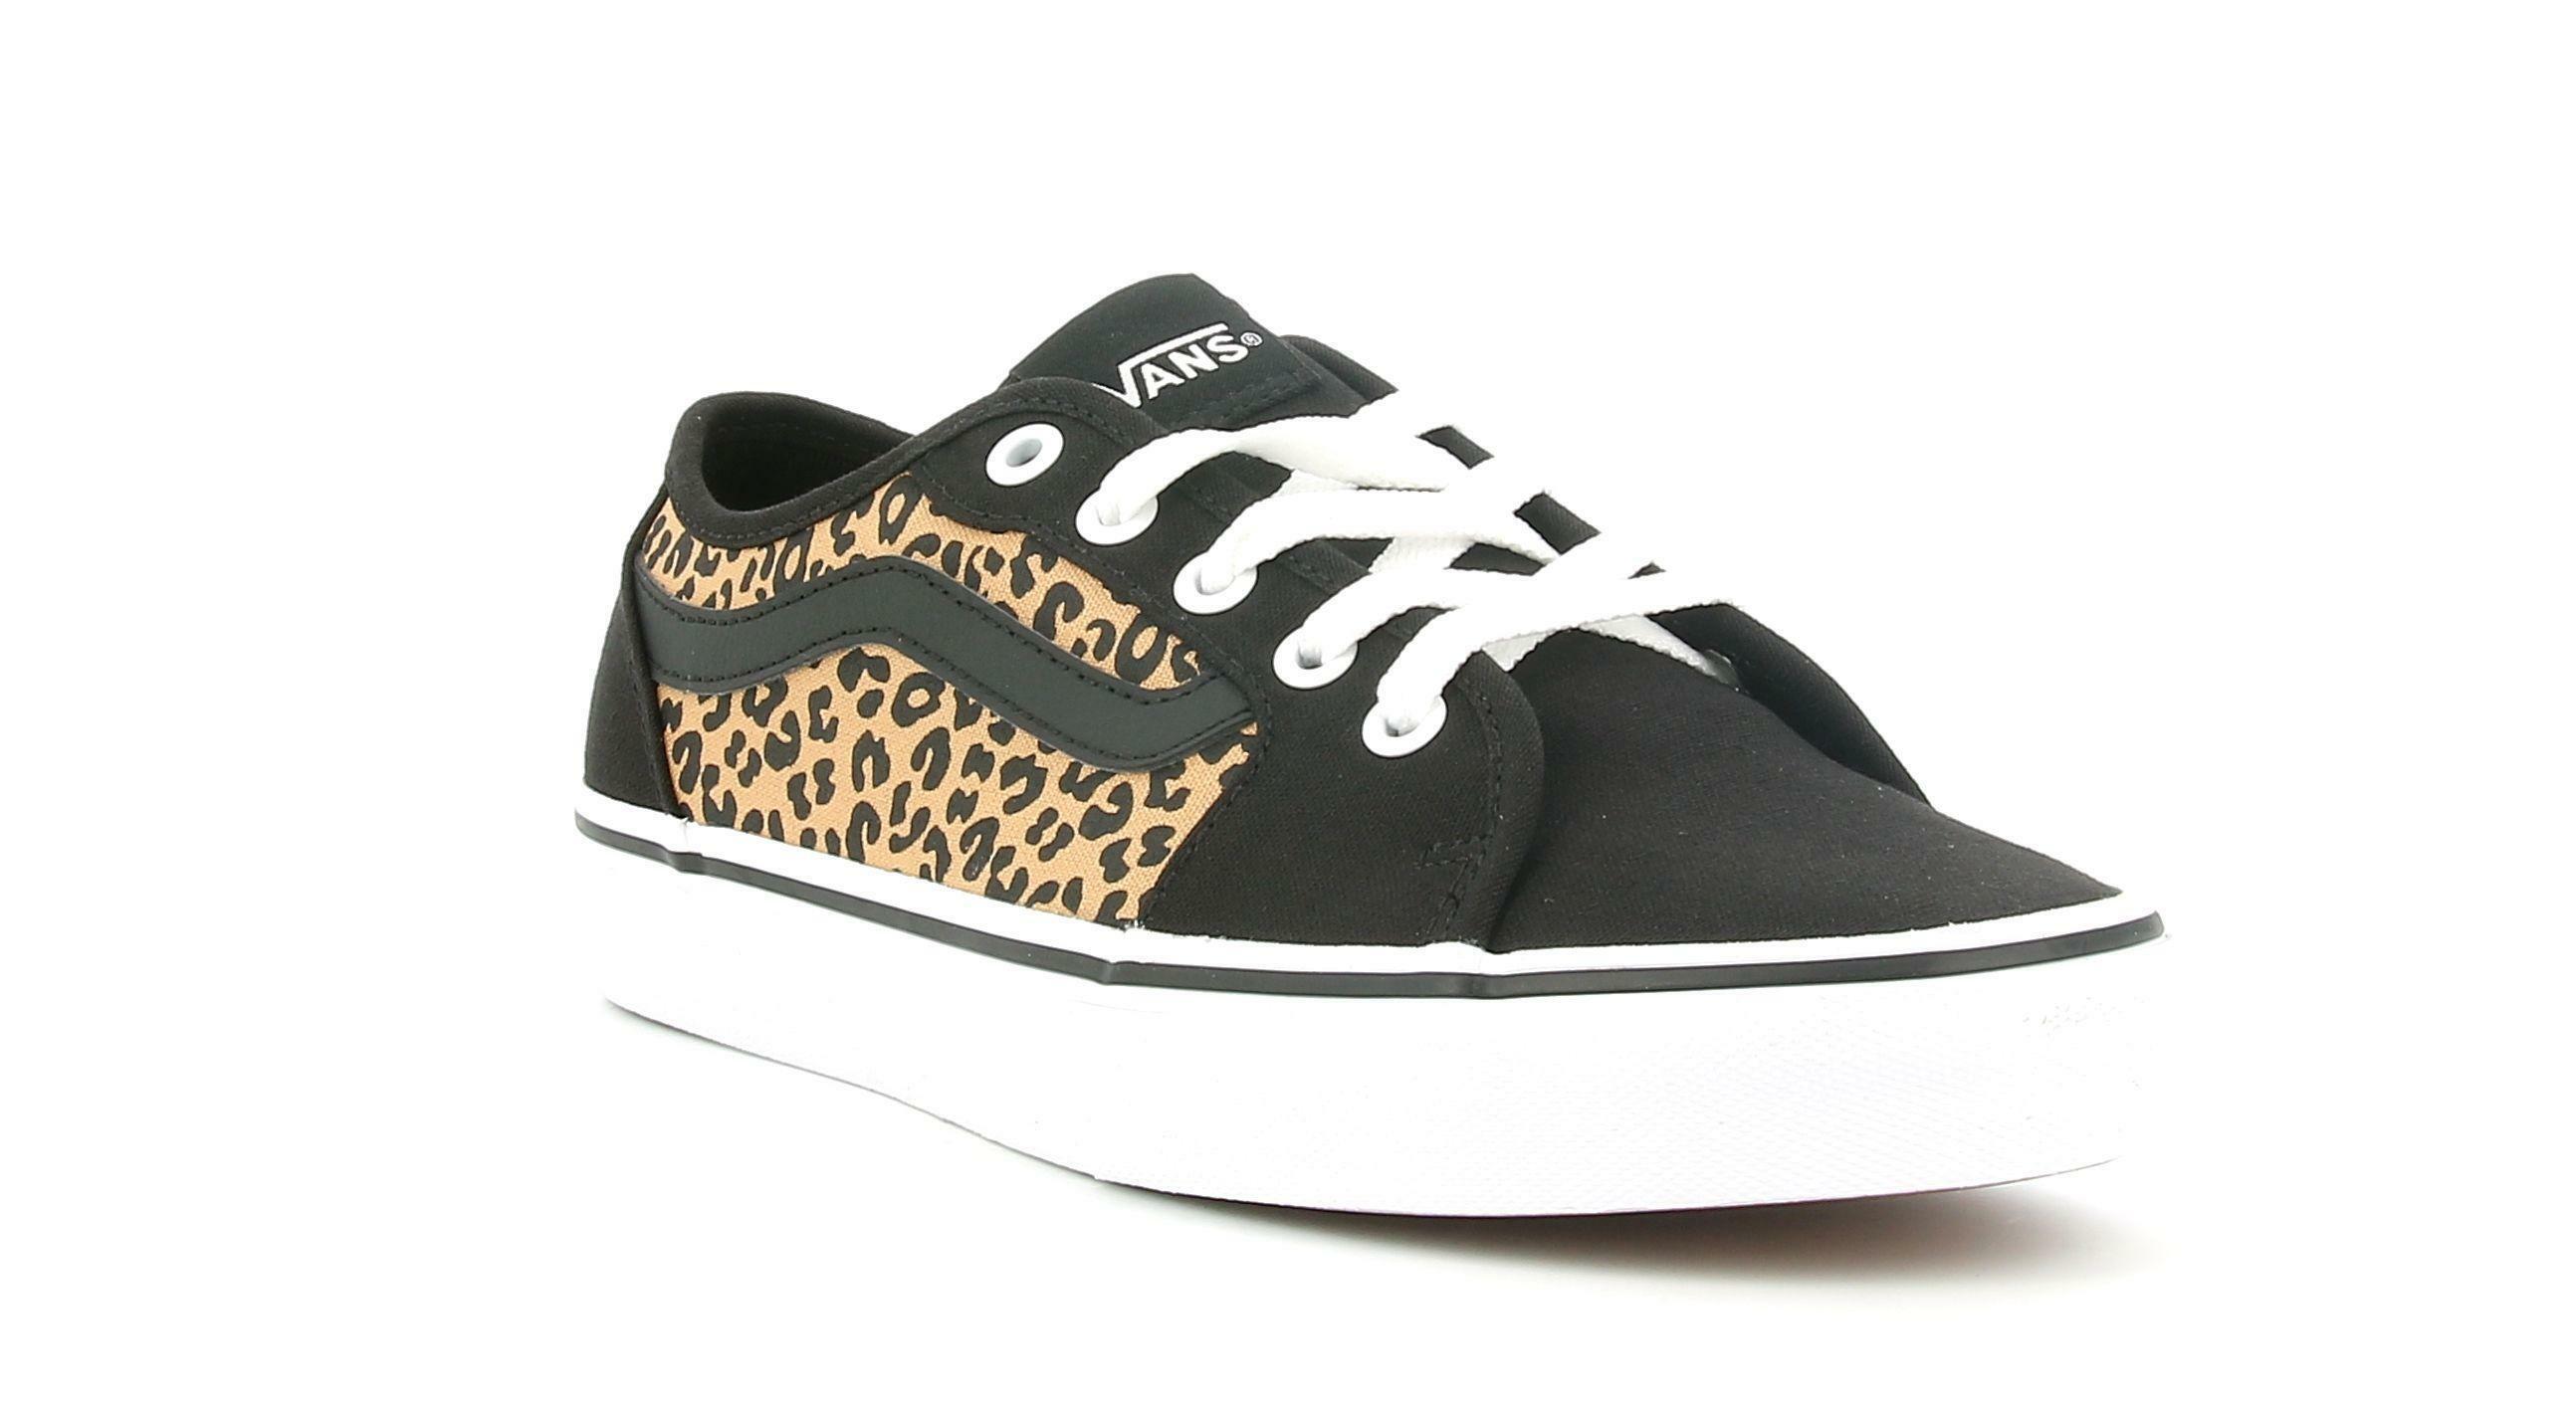 vans vans filmore decon cheetah vn0a45nm36i1 sneaker donna nero/bianco